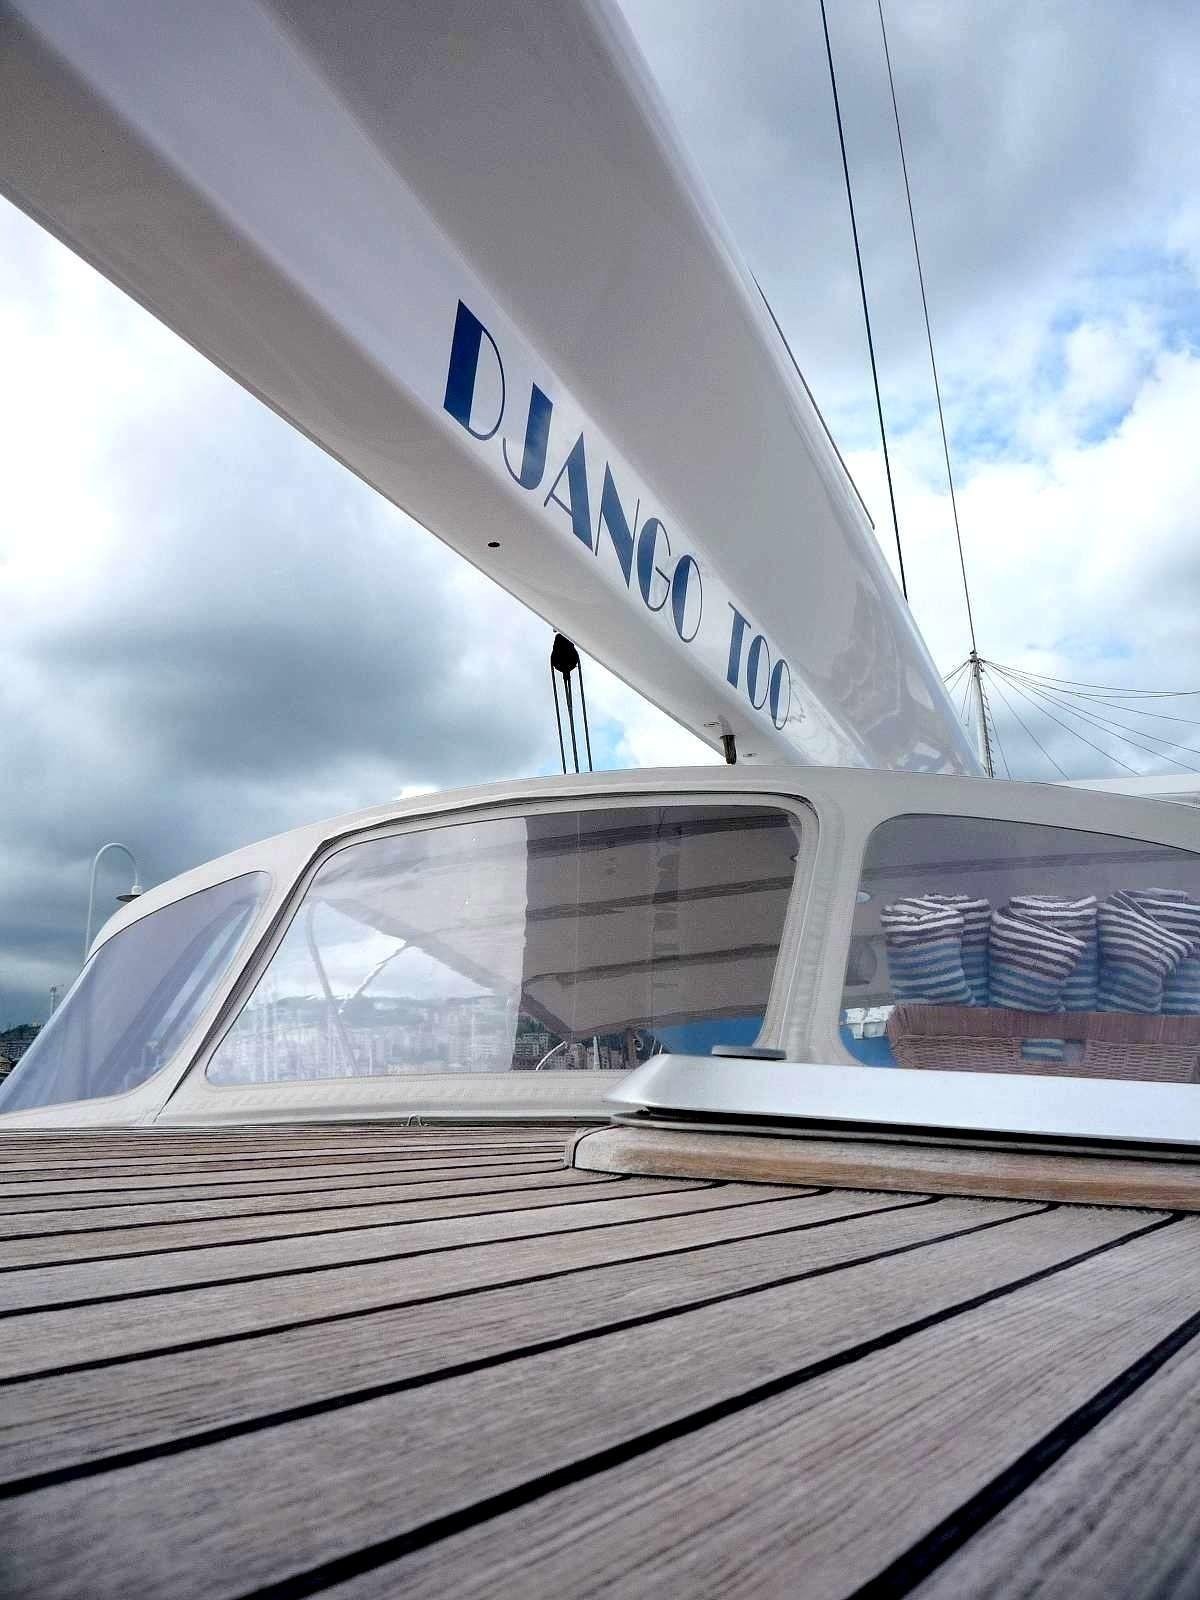 The 25m Yacht DJANGO TOO